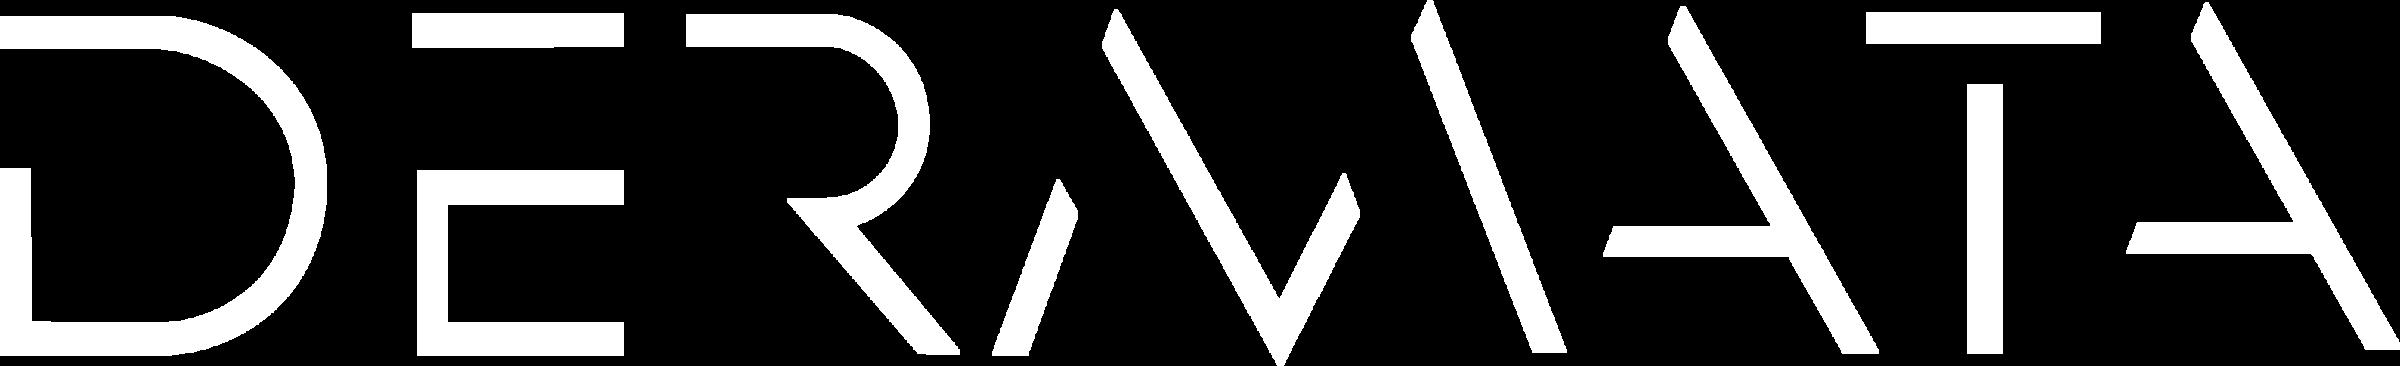 Dermata Logo